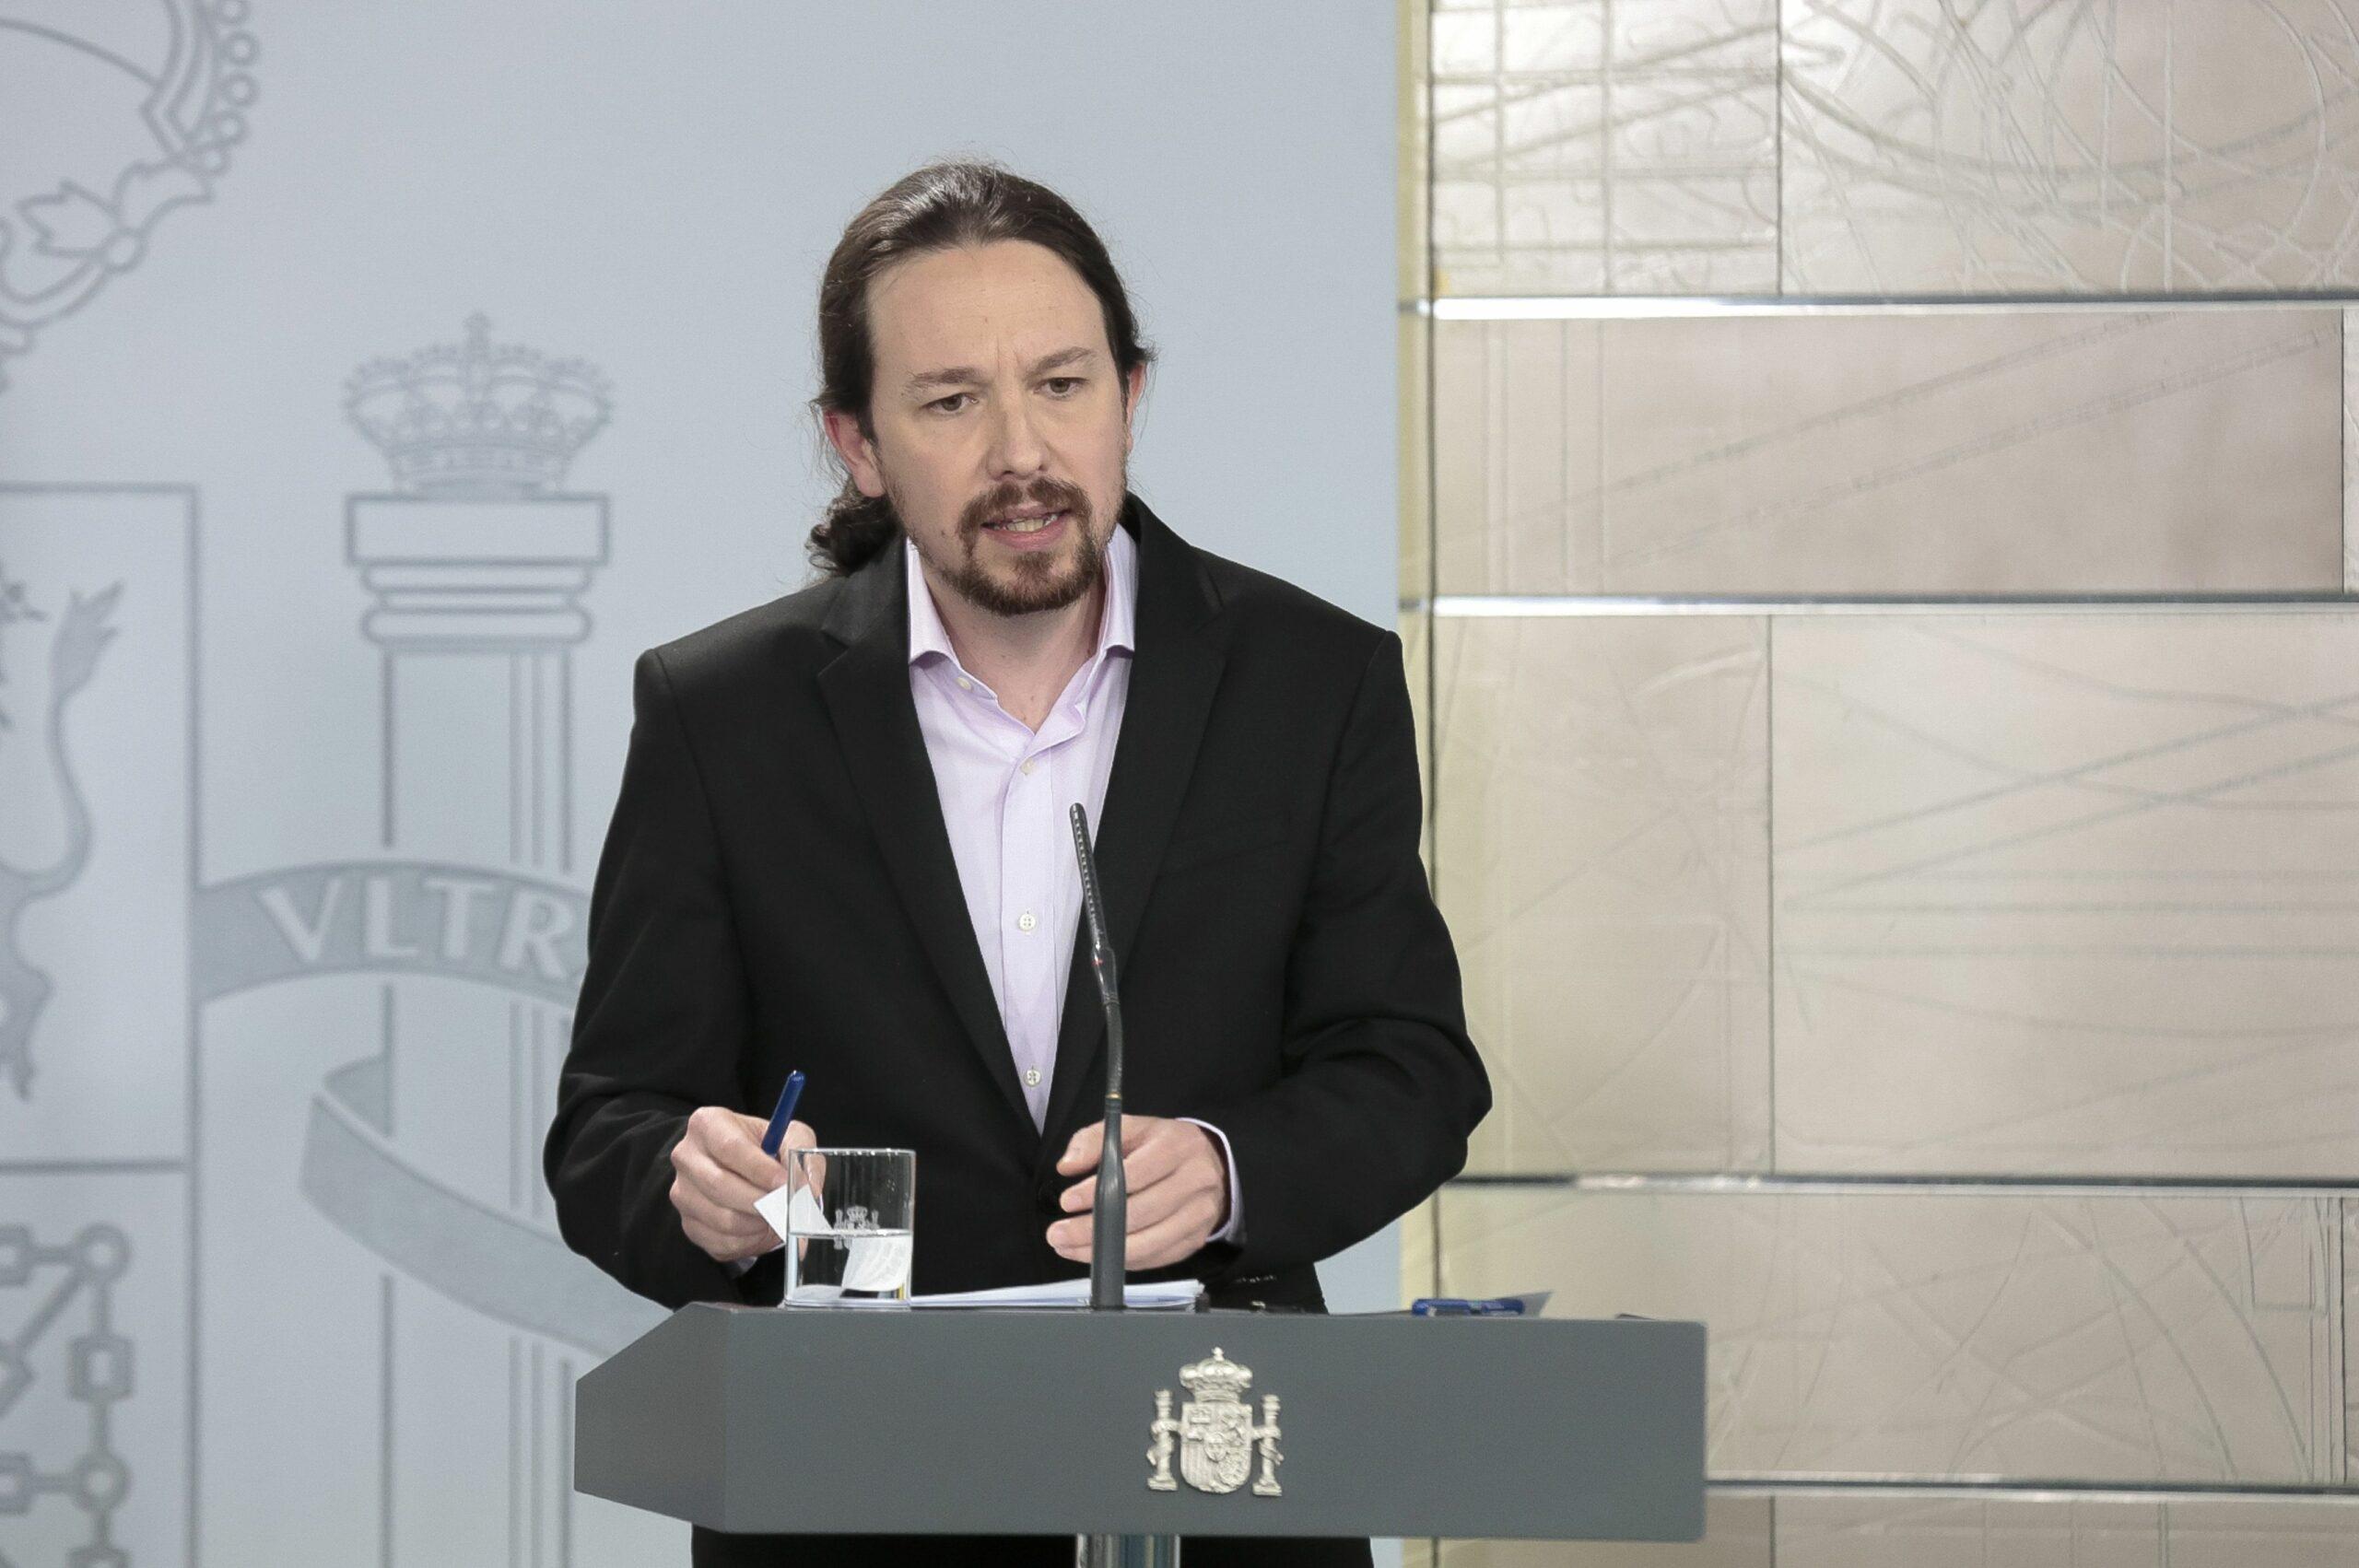 El vicepresident segon del govern espanyol, Pablo Iglesias